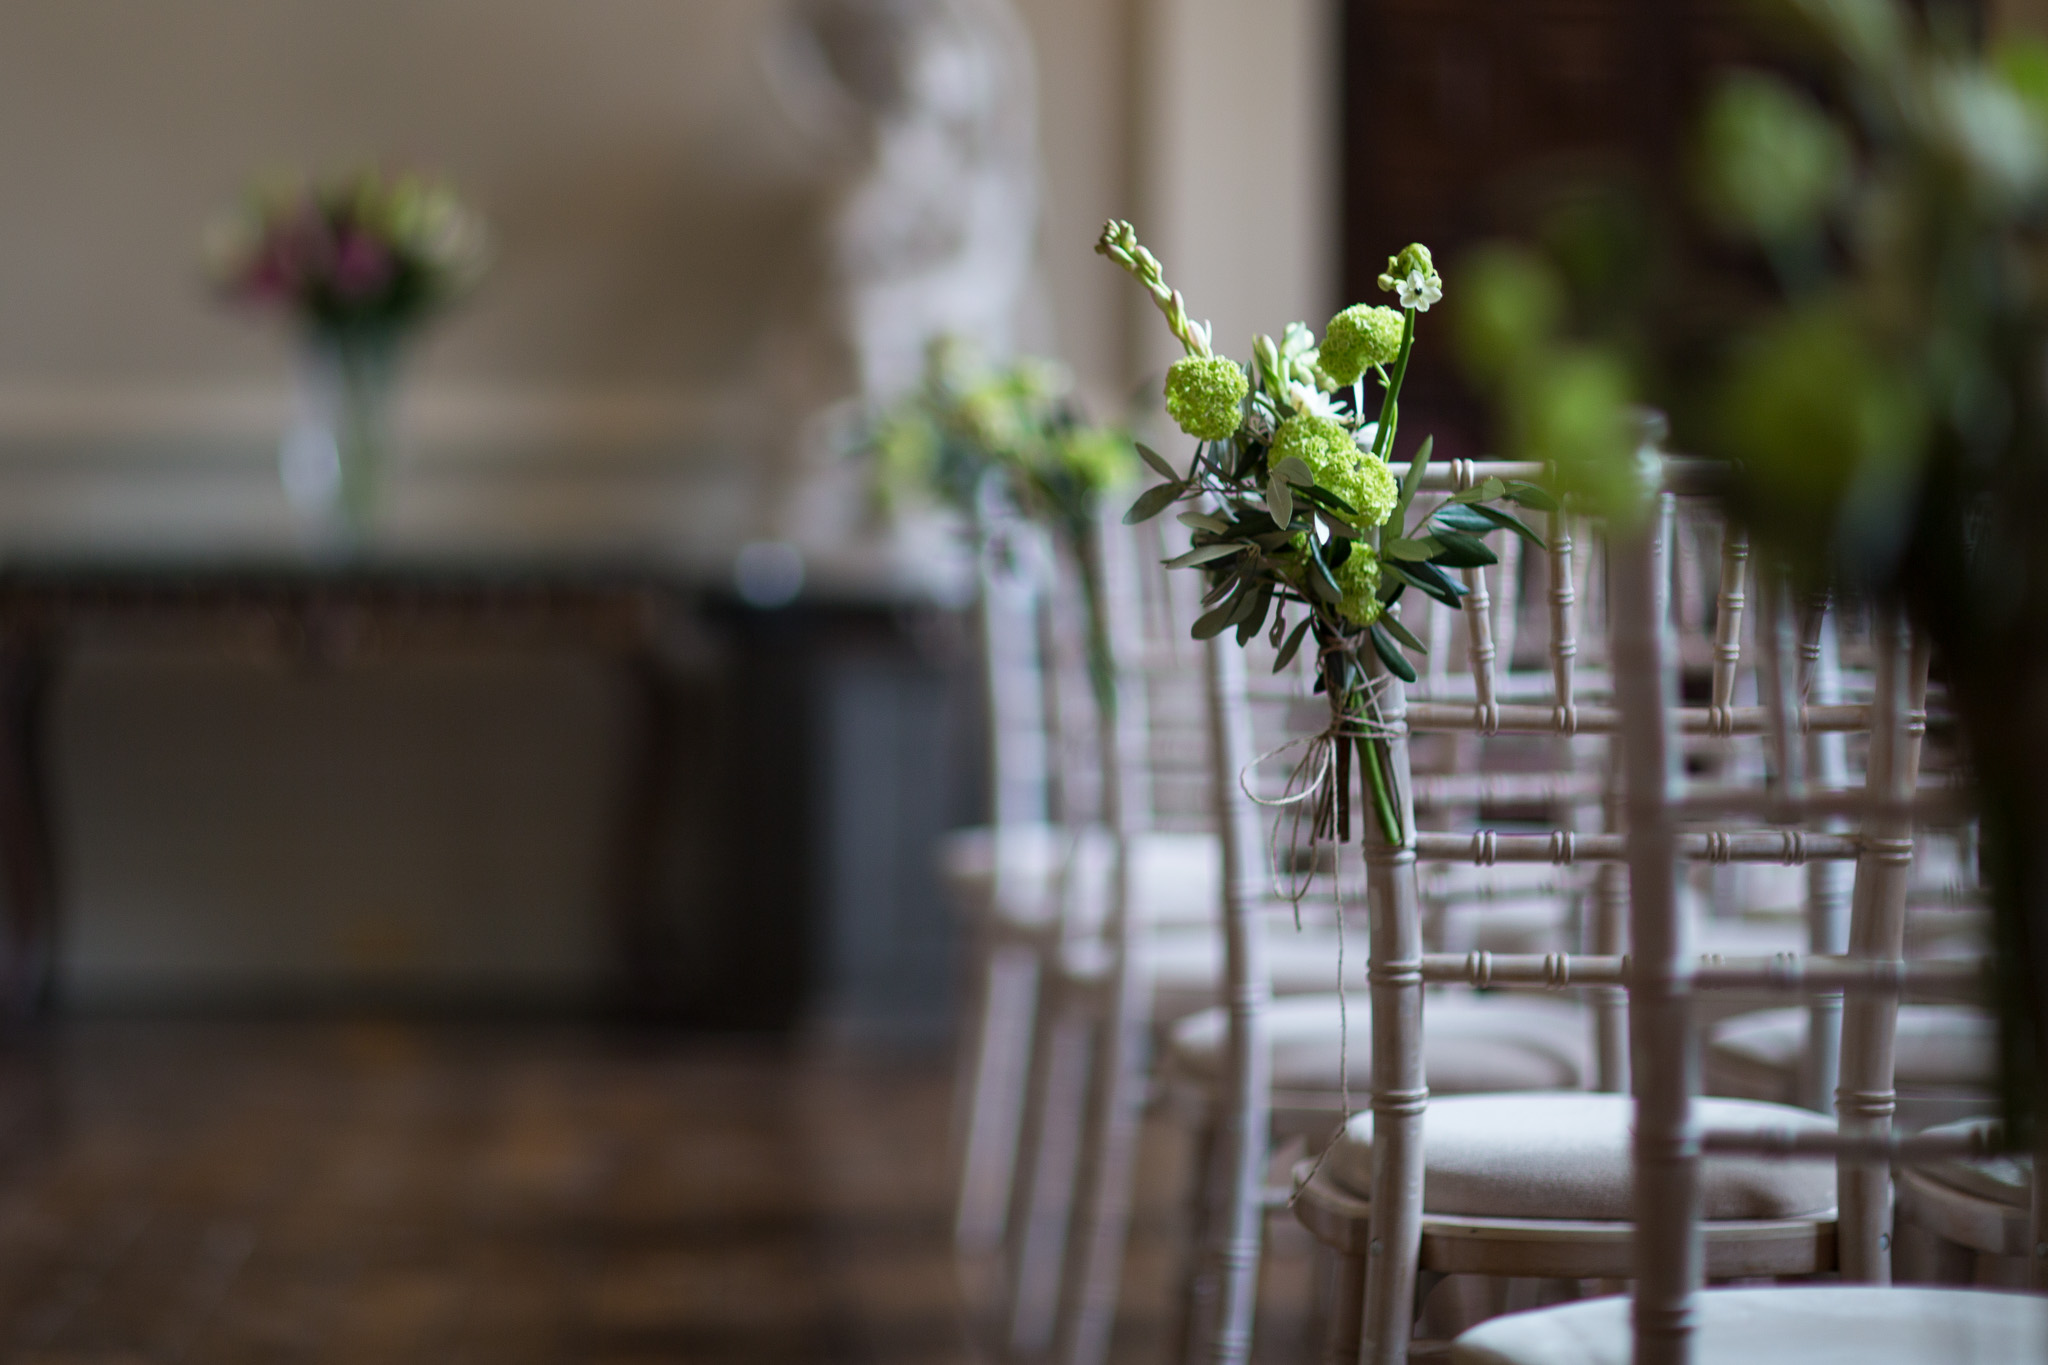 Mark_Barnes_Gloucester_Wedding_Photographer_Elmore_Court_Wedding_Photography_Mike+Kelly-12.jpg